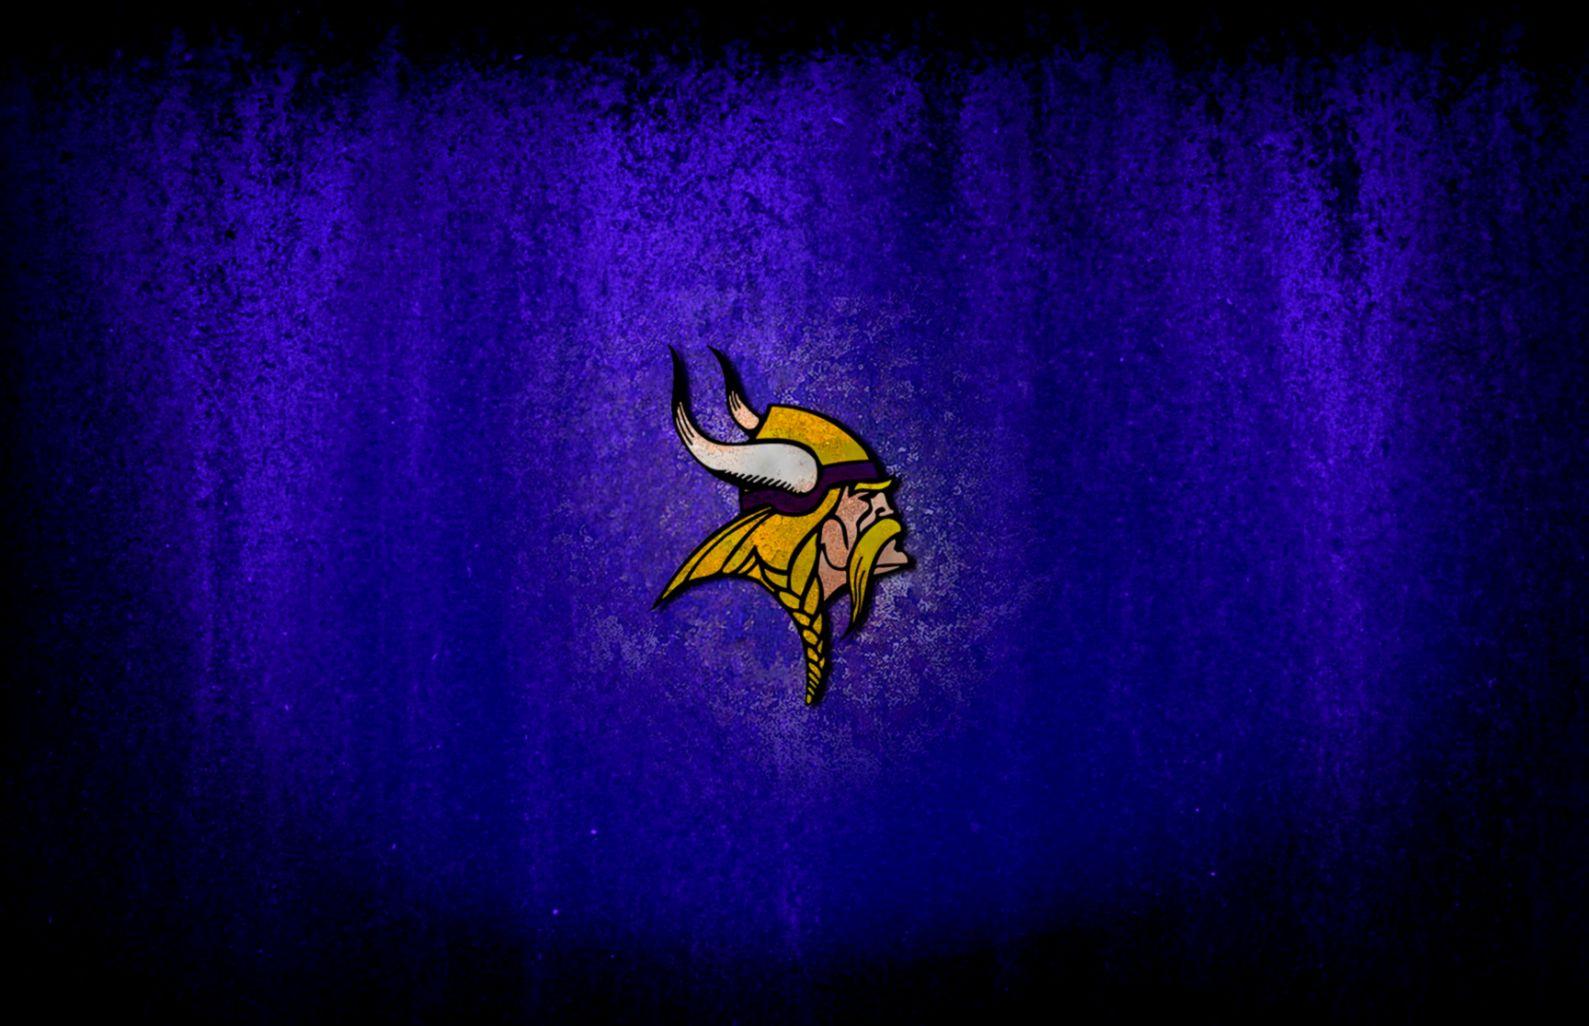 Nfl Minnesota Vikings Eclipse Wallpaper